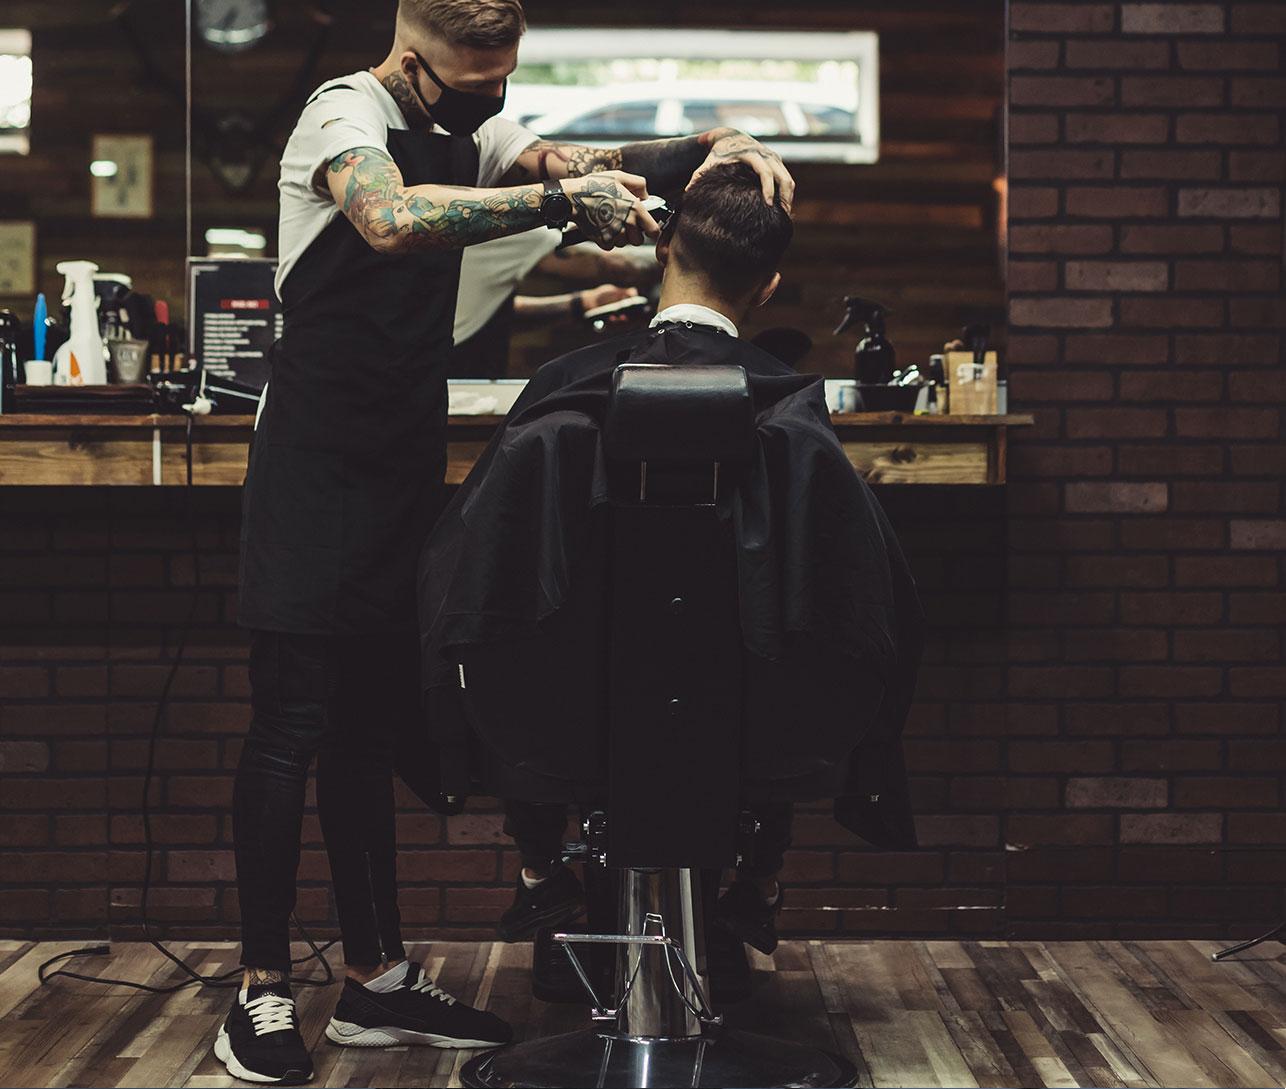 Barbershop Lojinha do Barbeiro